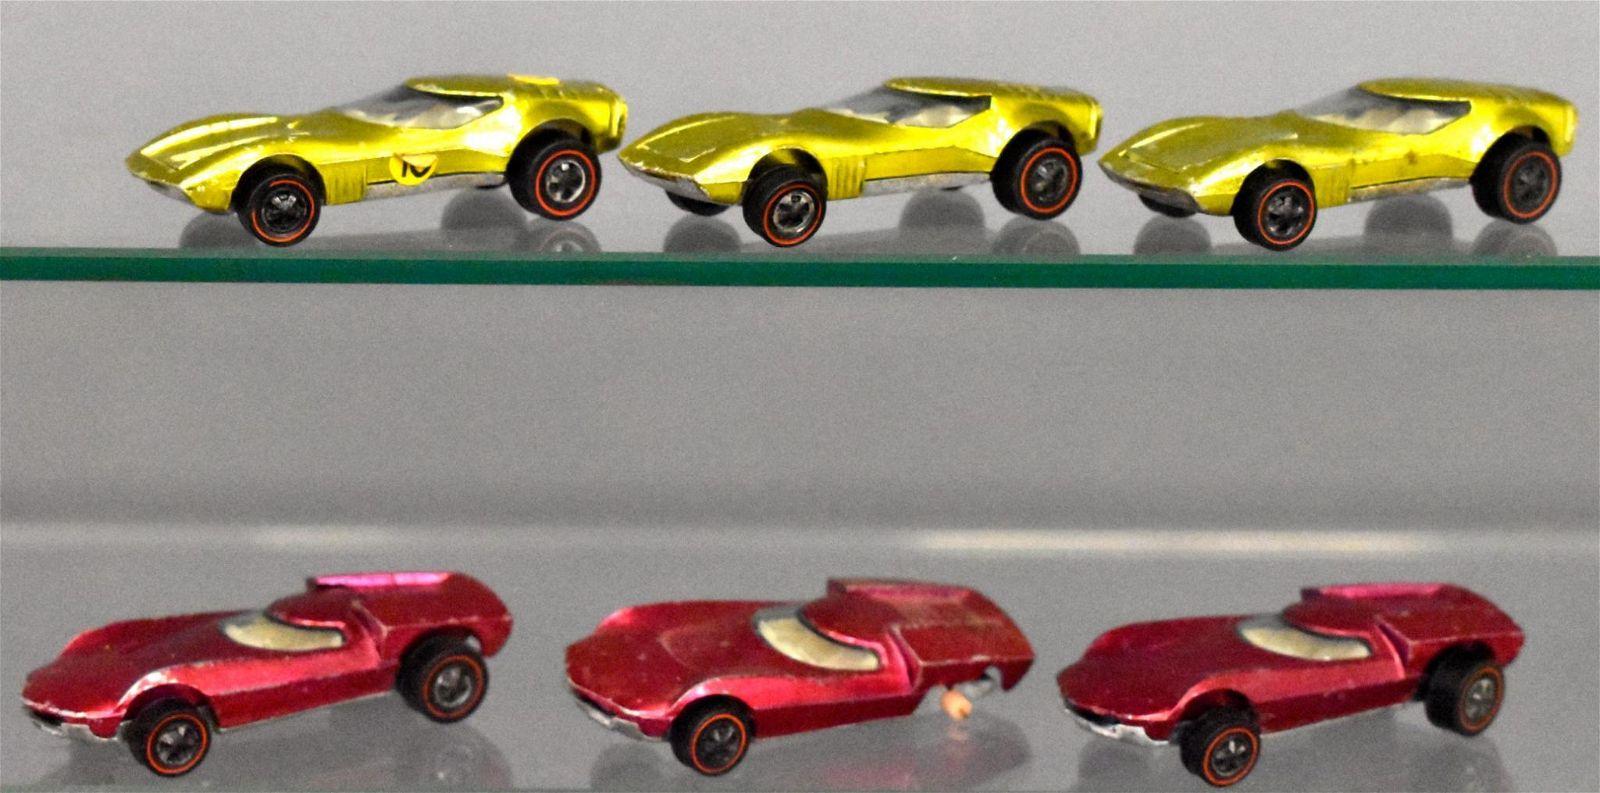 Group of six Mattel Hot Wheels Redlines loose